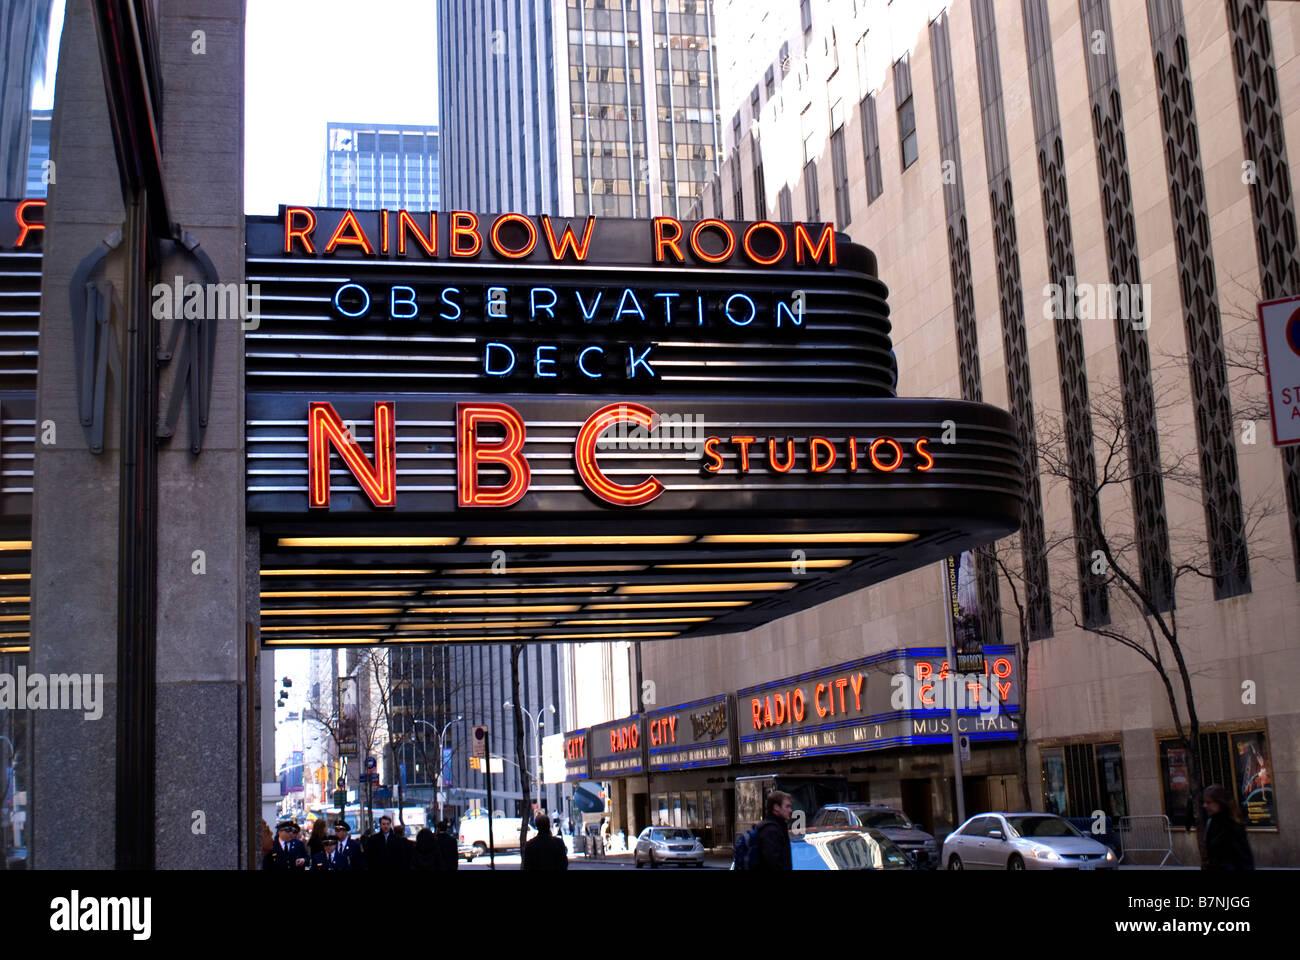 30 Rockefeller Plaza New York City Home Of Nbc Television Studios Stock Photo Alamy